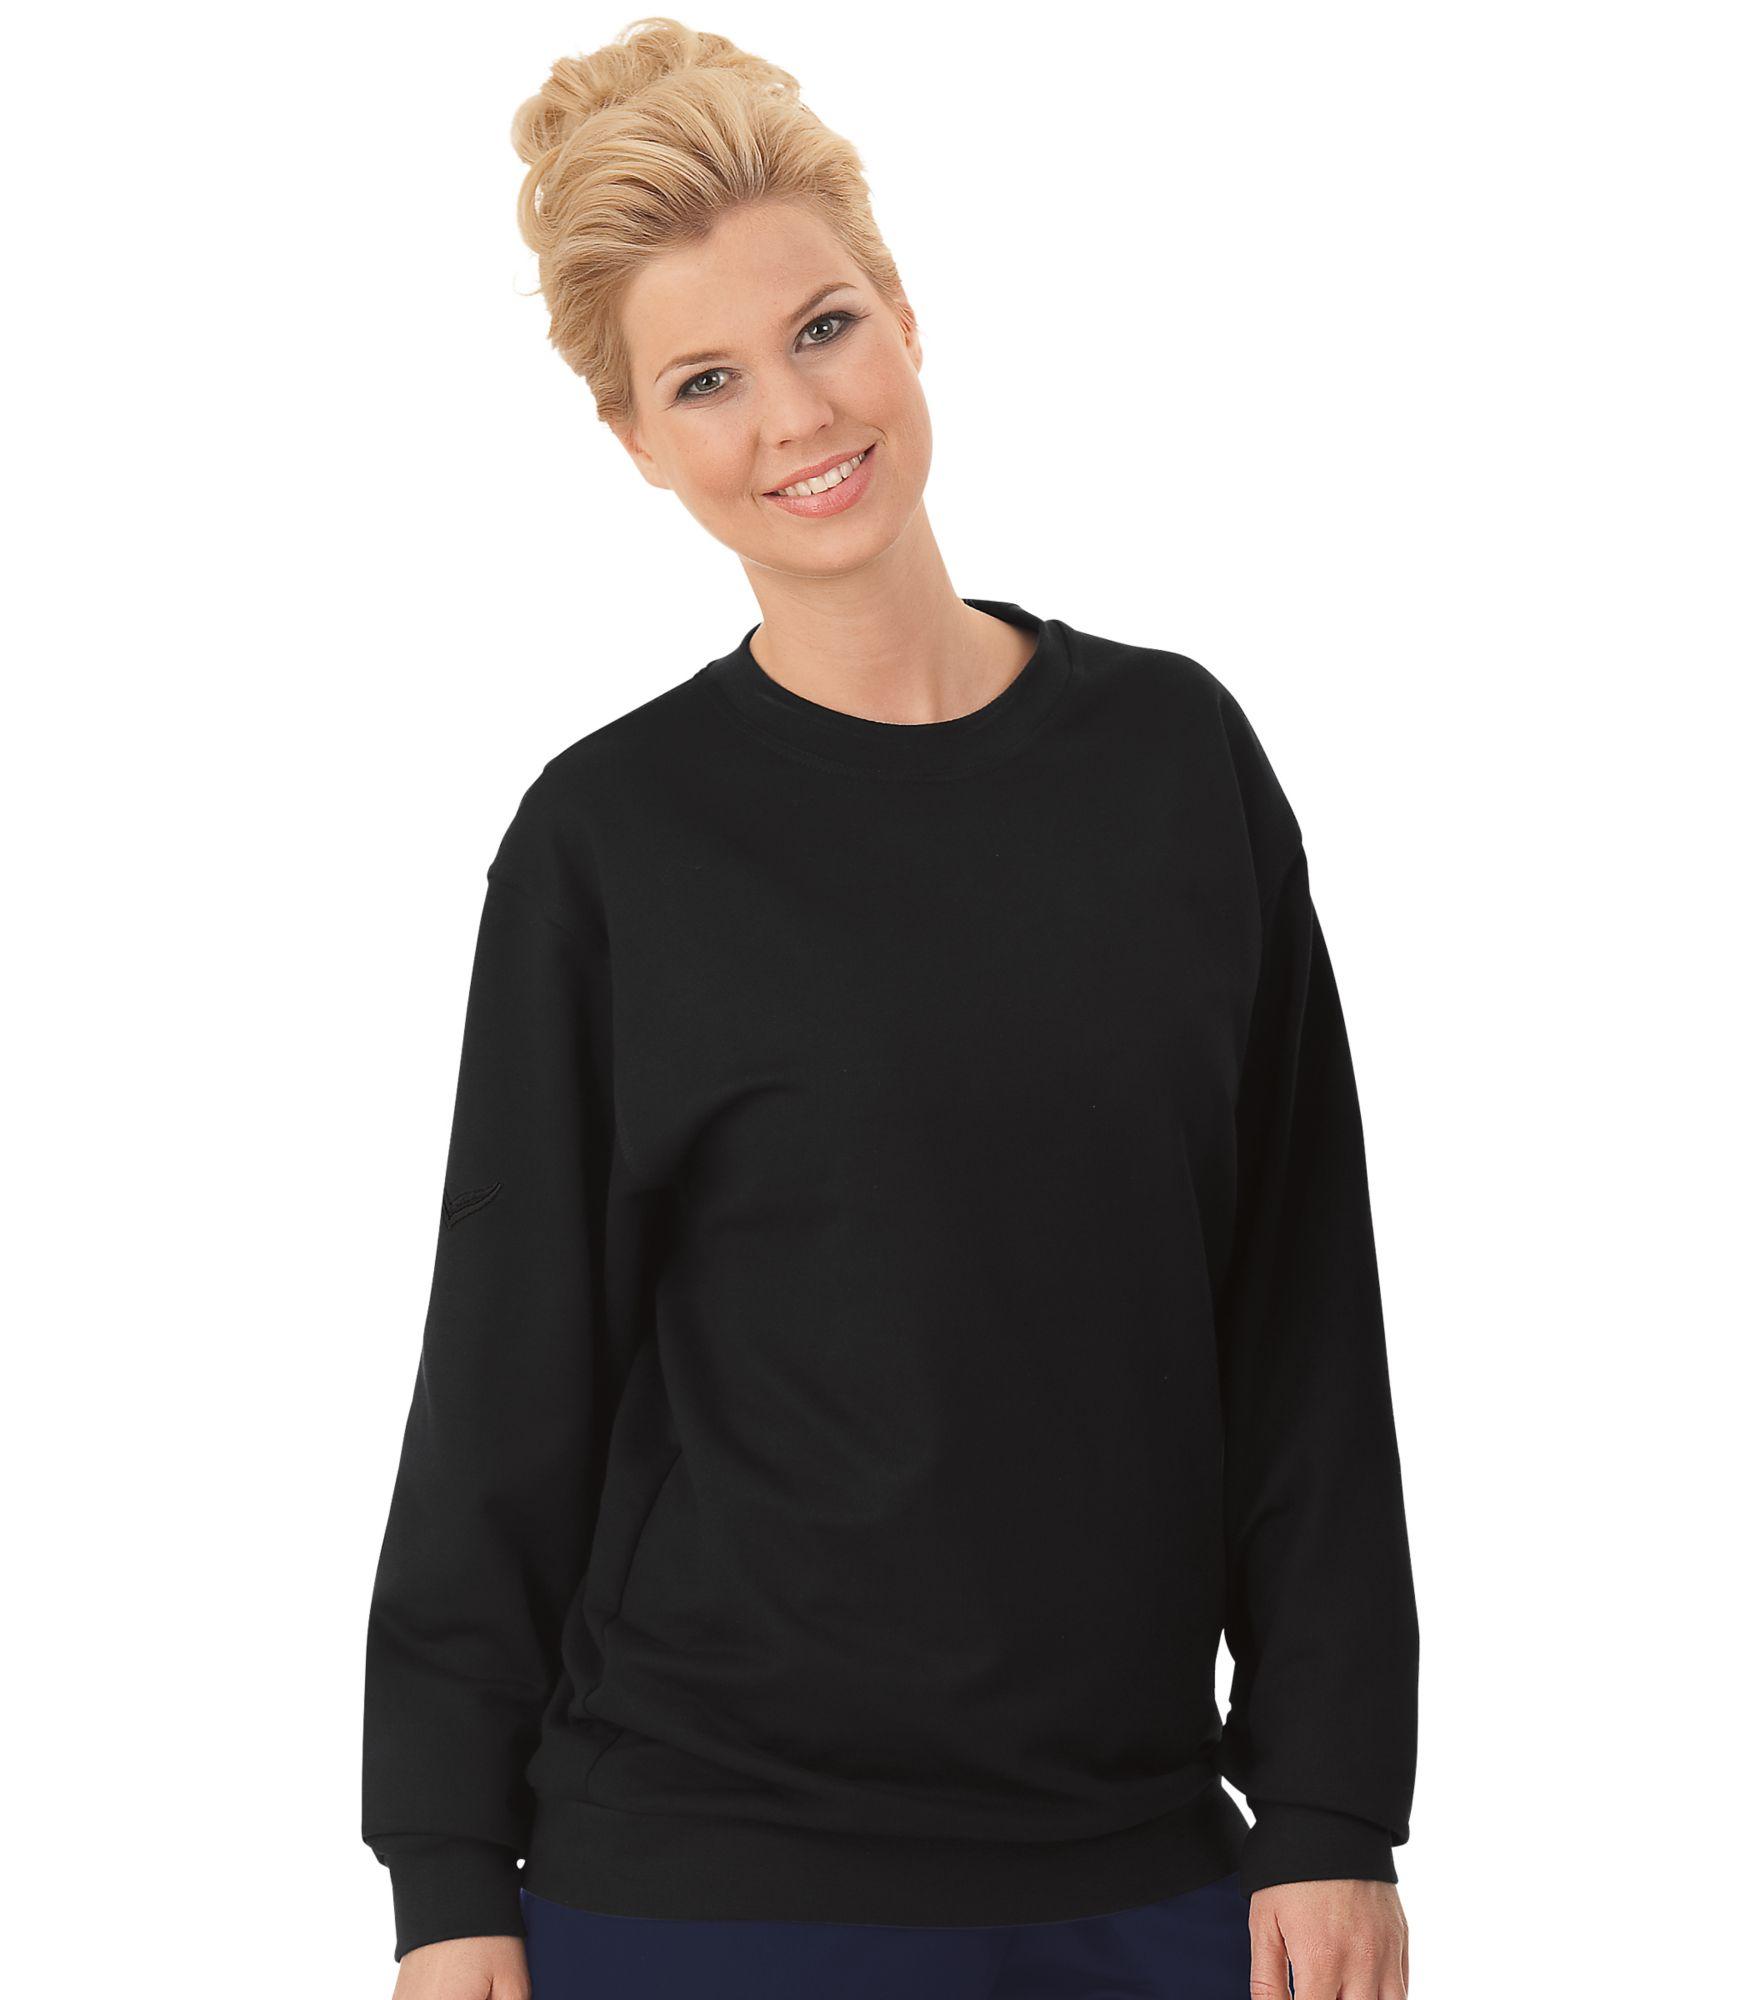 trigema bio sweat shirt schwab versand sweatshirts. Black Bedroom Furniture Sets. Home Design Ideas